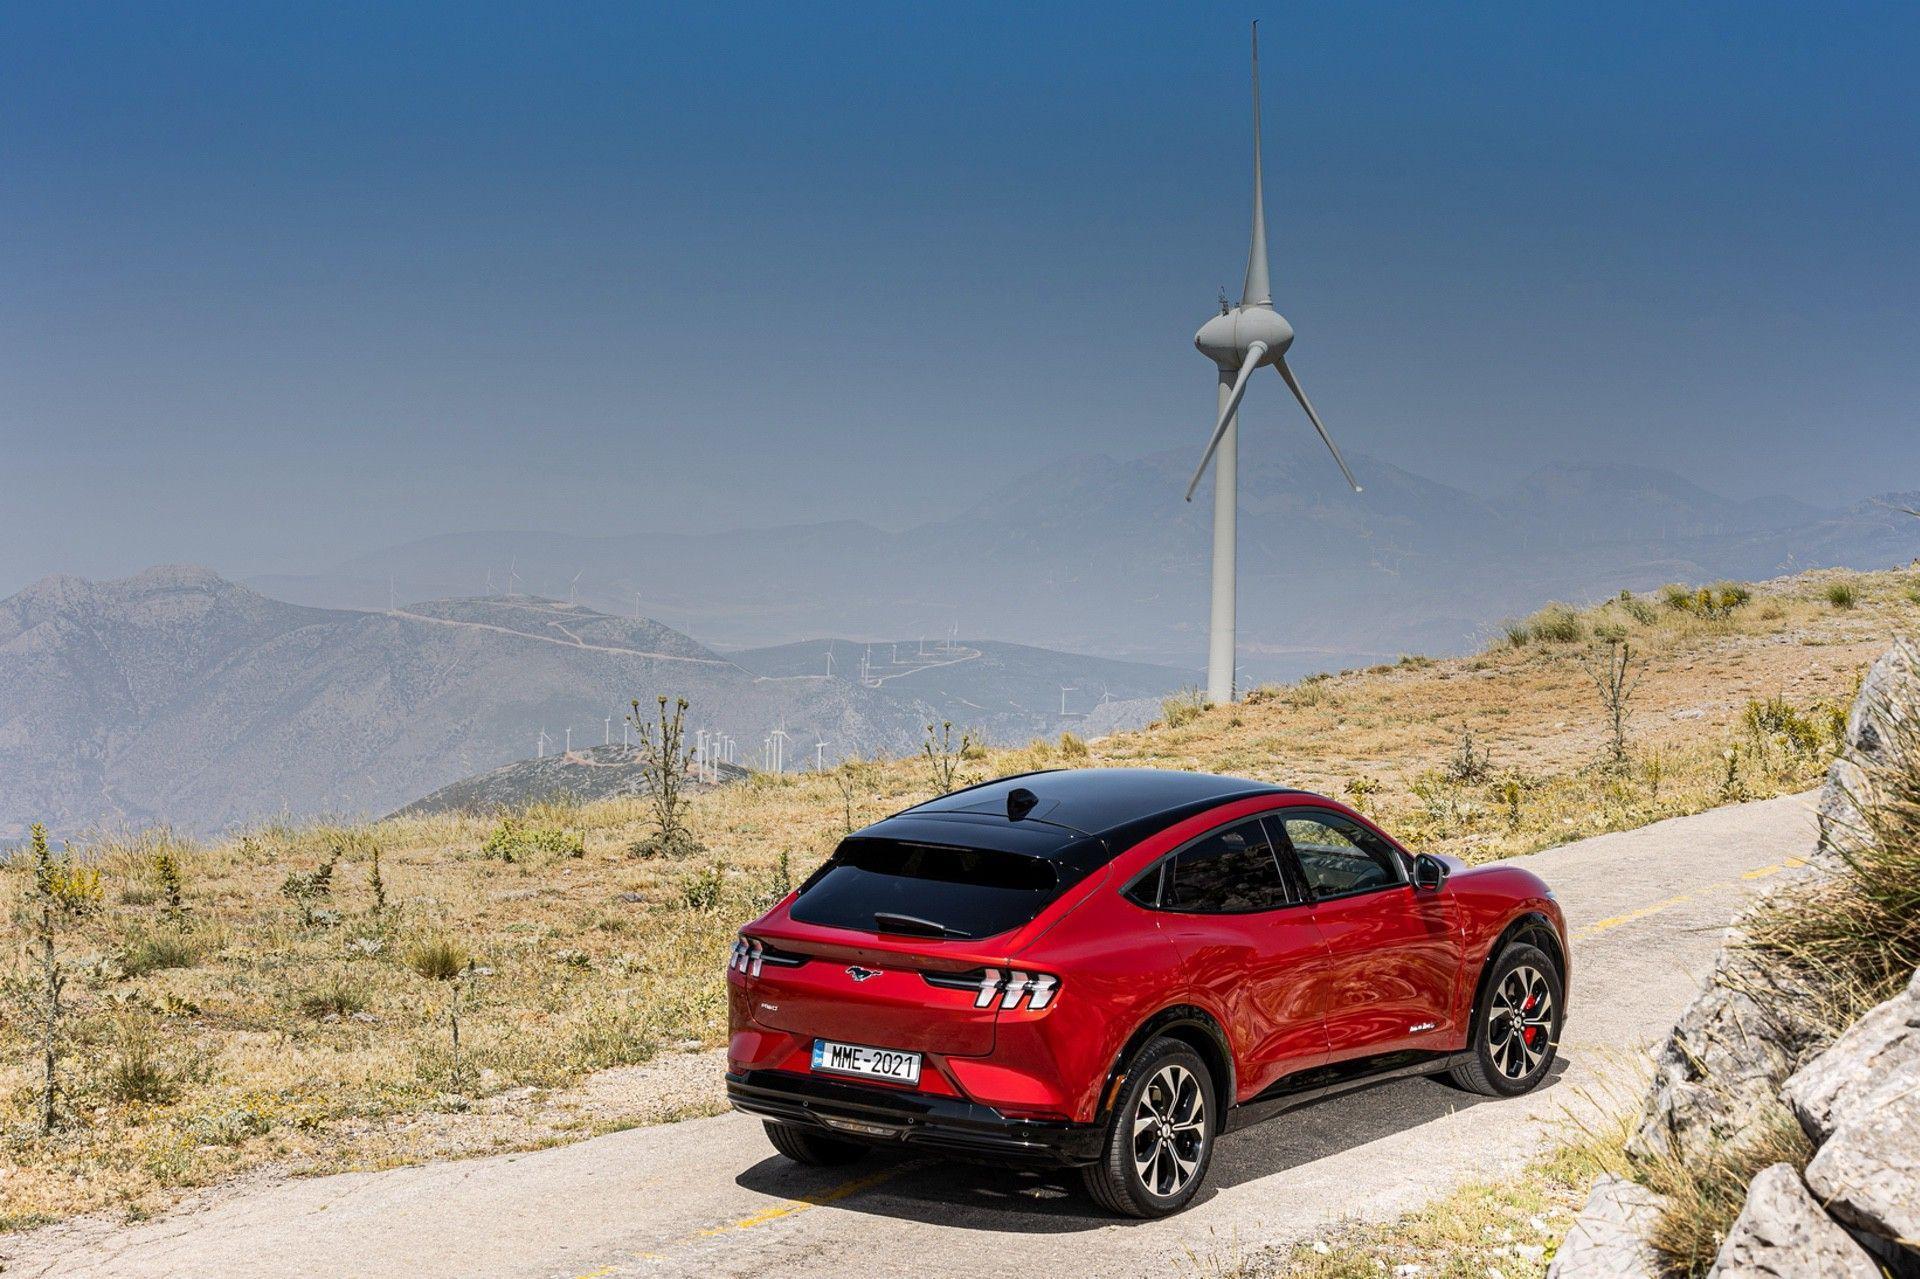 Ford_Mustang_Mach-E_greek_presskit-0062